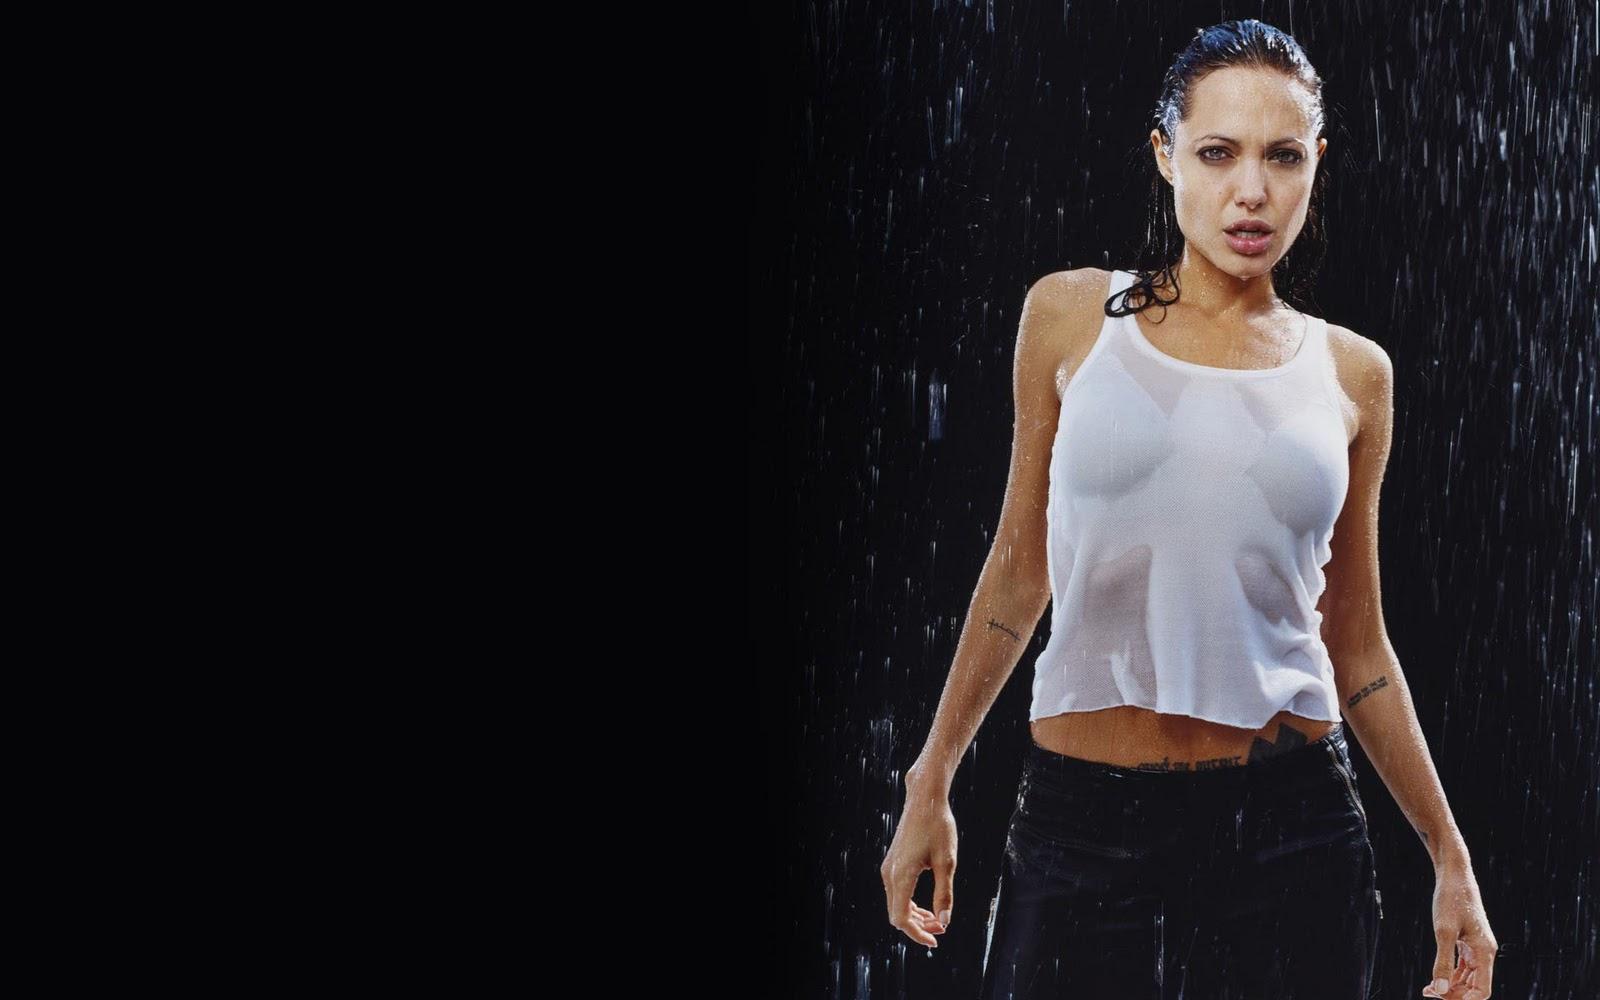 http://1.bp.blogspot.com/-GLAr9zCXSJg/TniNVmR7oRI/AAAAAAAACXw/ATmYUadqALQ/s1600/Angelina_Jolie+rain.jpg